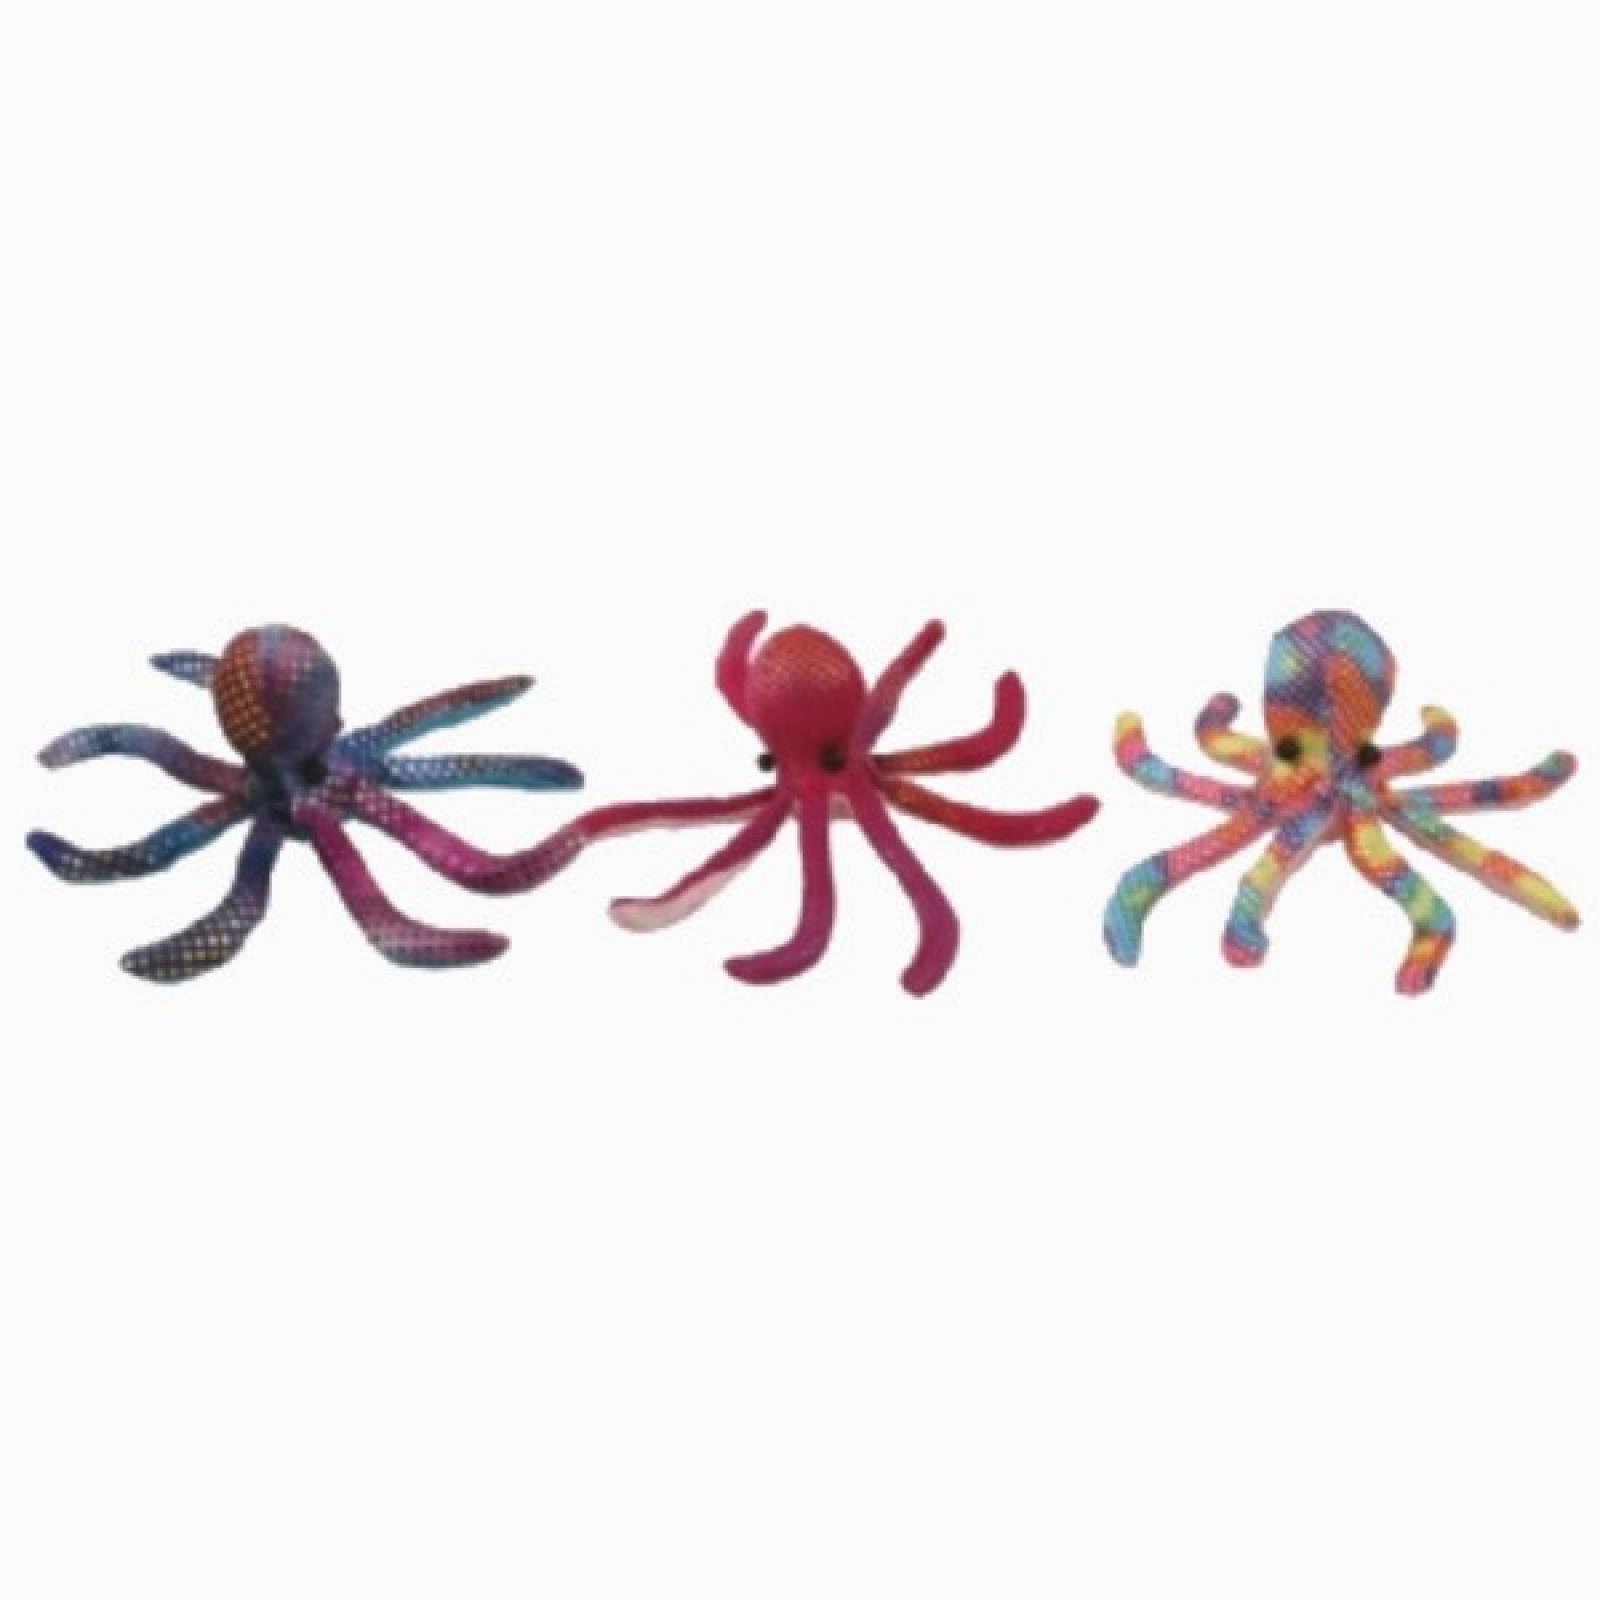 Small Octopus Sandimal Toy 3+